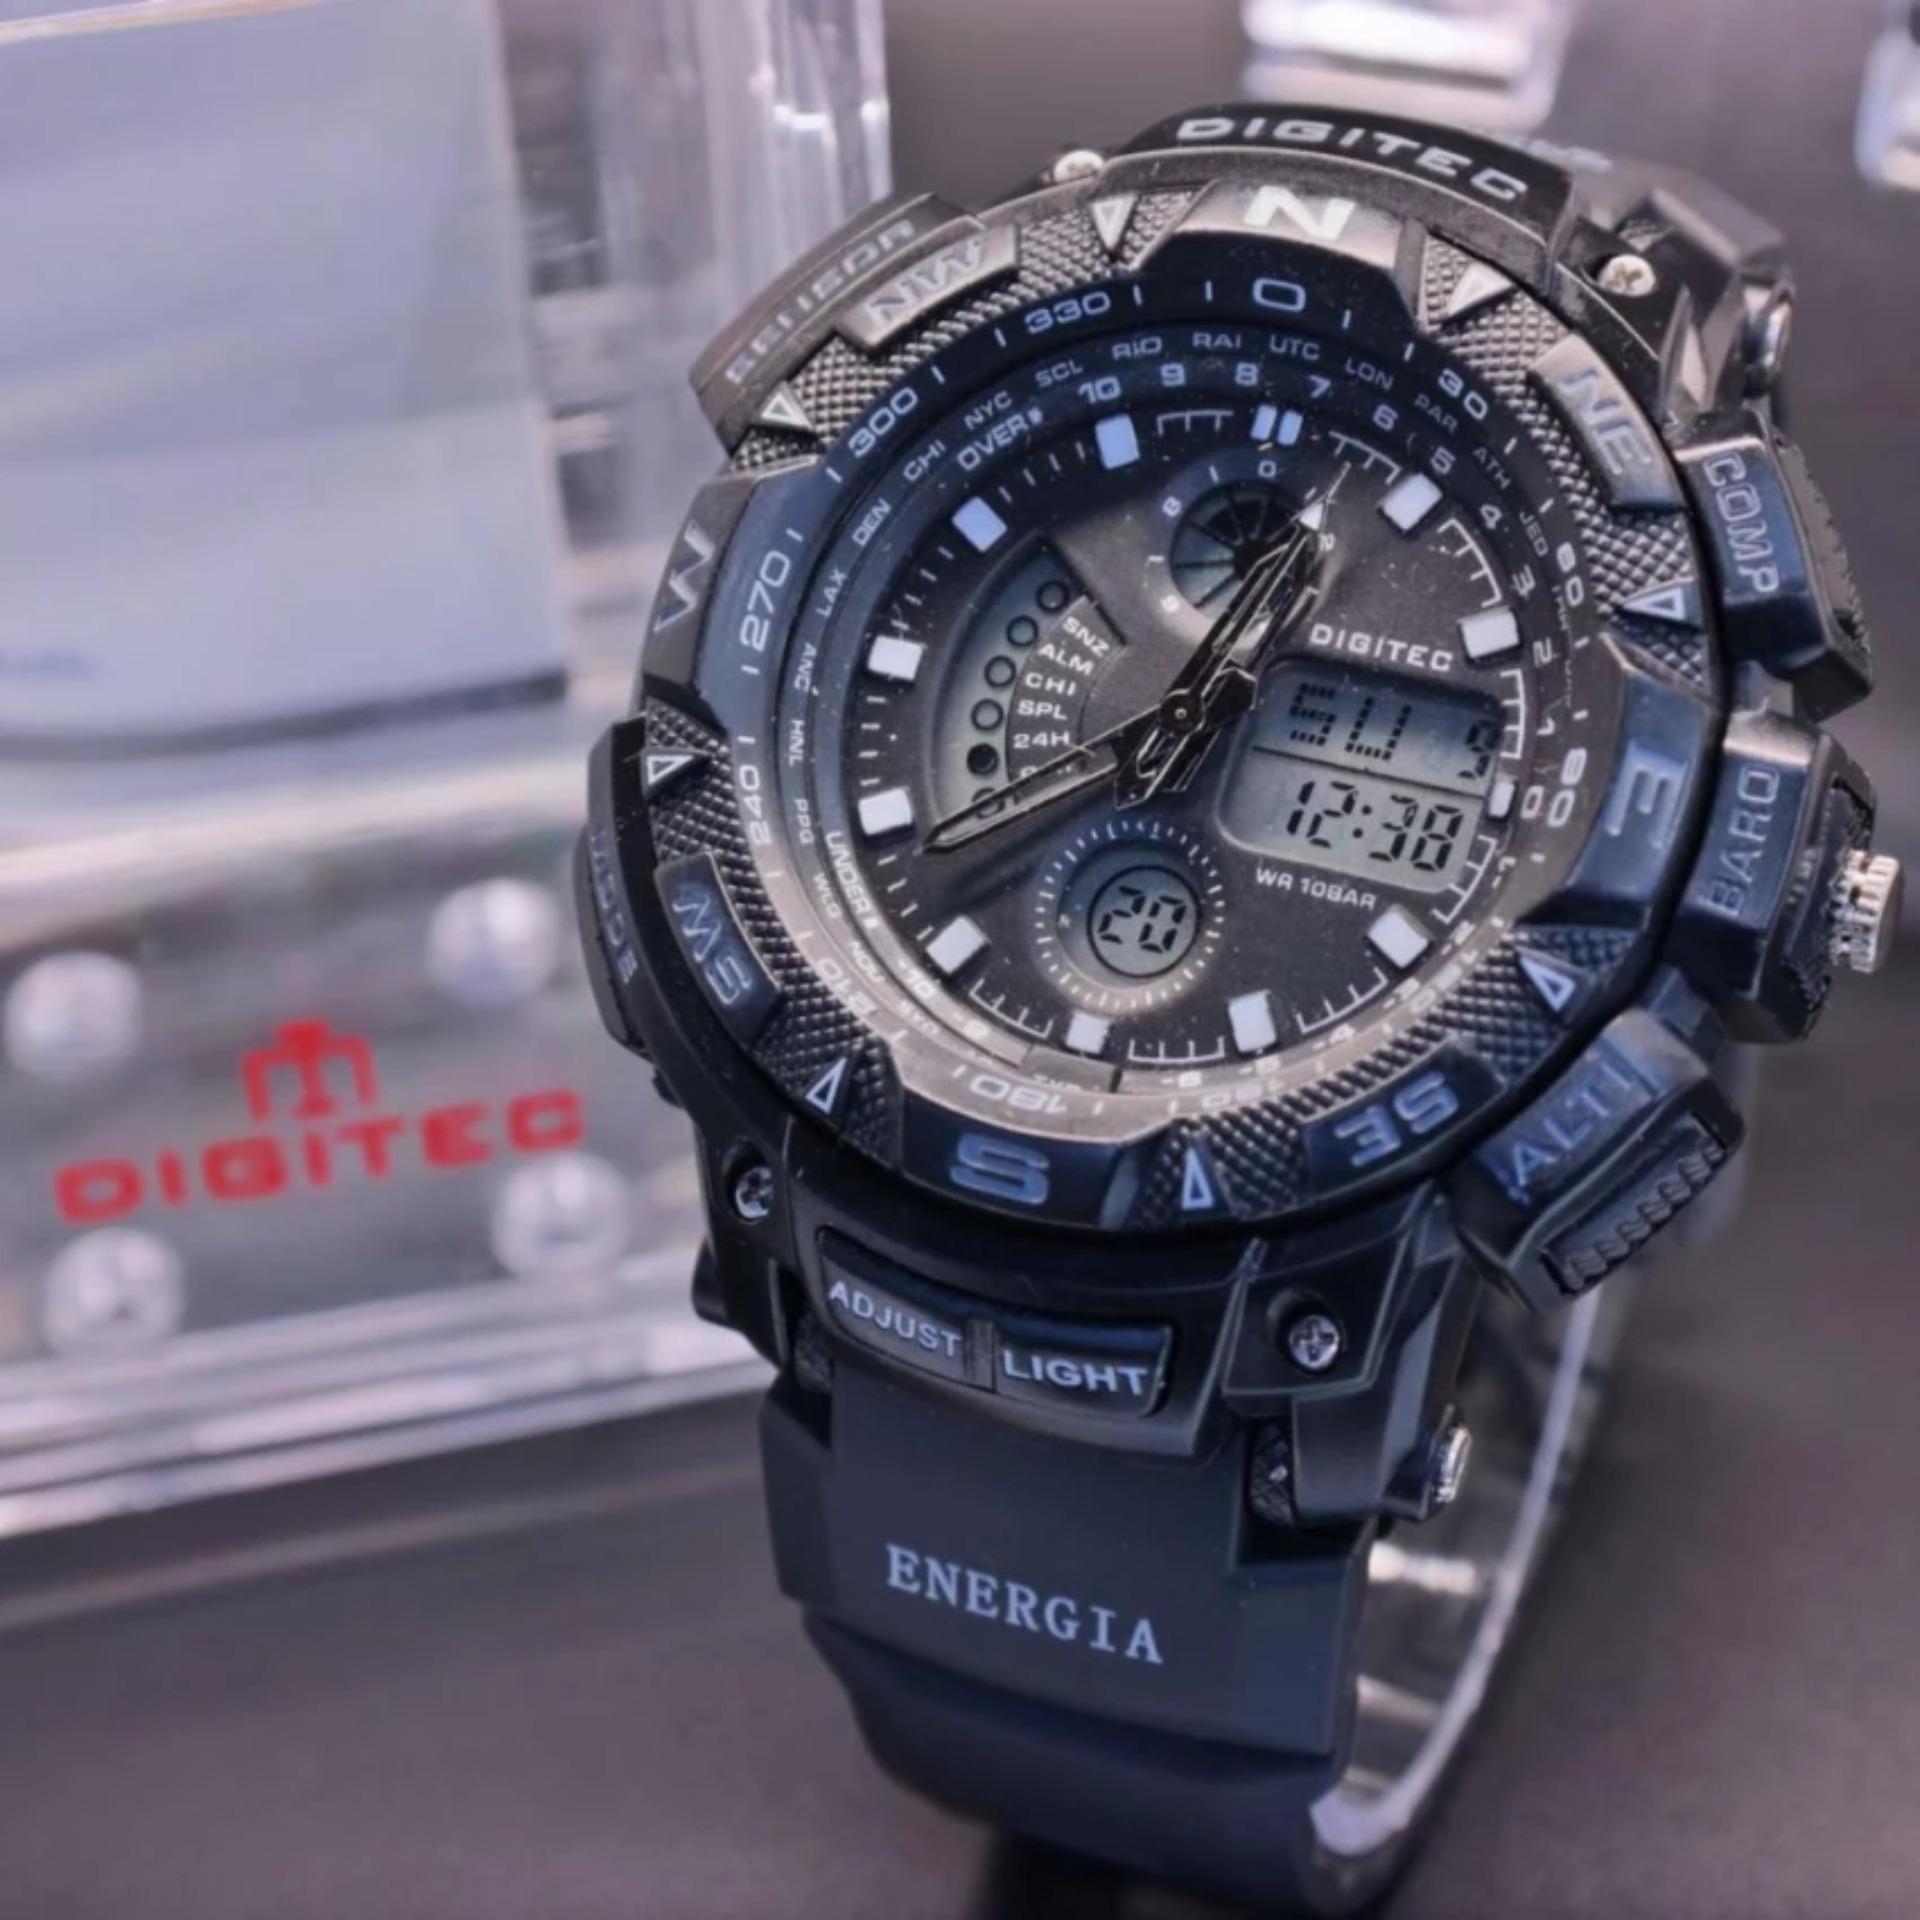 Watches Digitec Jam Tangan Sport Couple Original Black Grey Dg 2044t Rubber Strap Kombinasi Bp